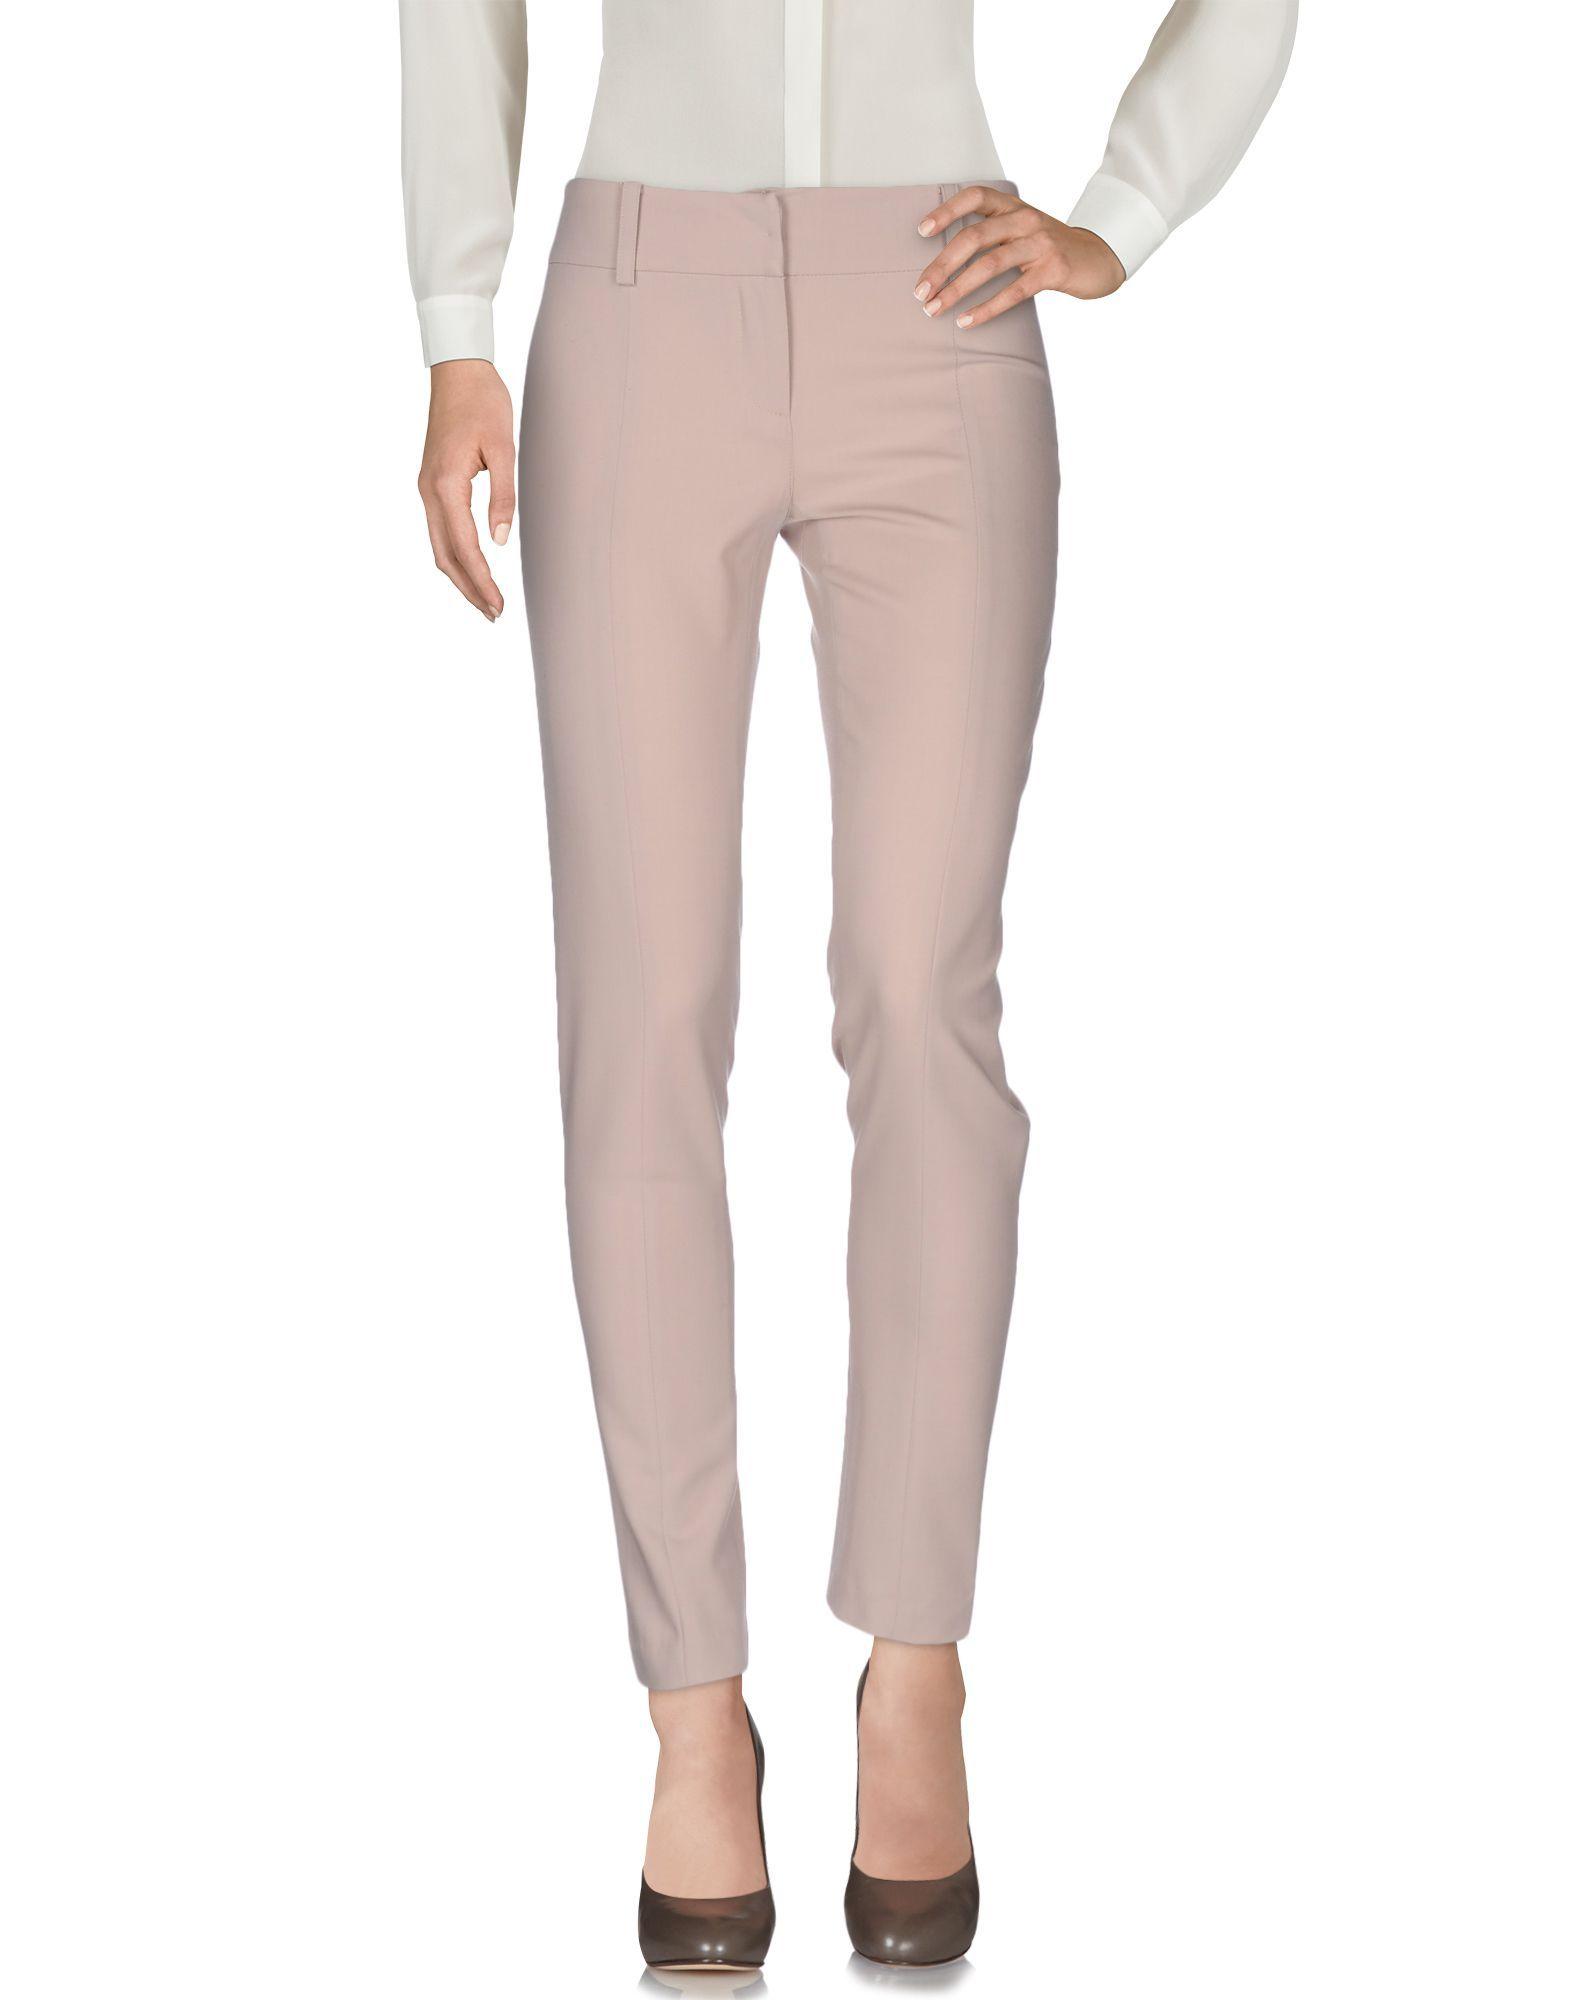 Patrizia Pepe Beige Virgin Wool Tailored Tapered Leg Trousers